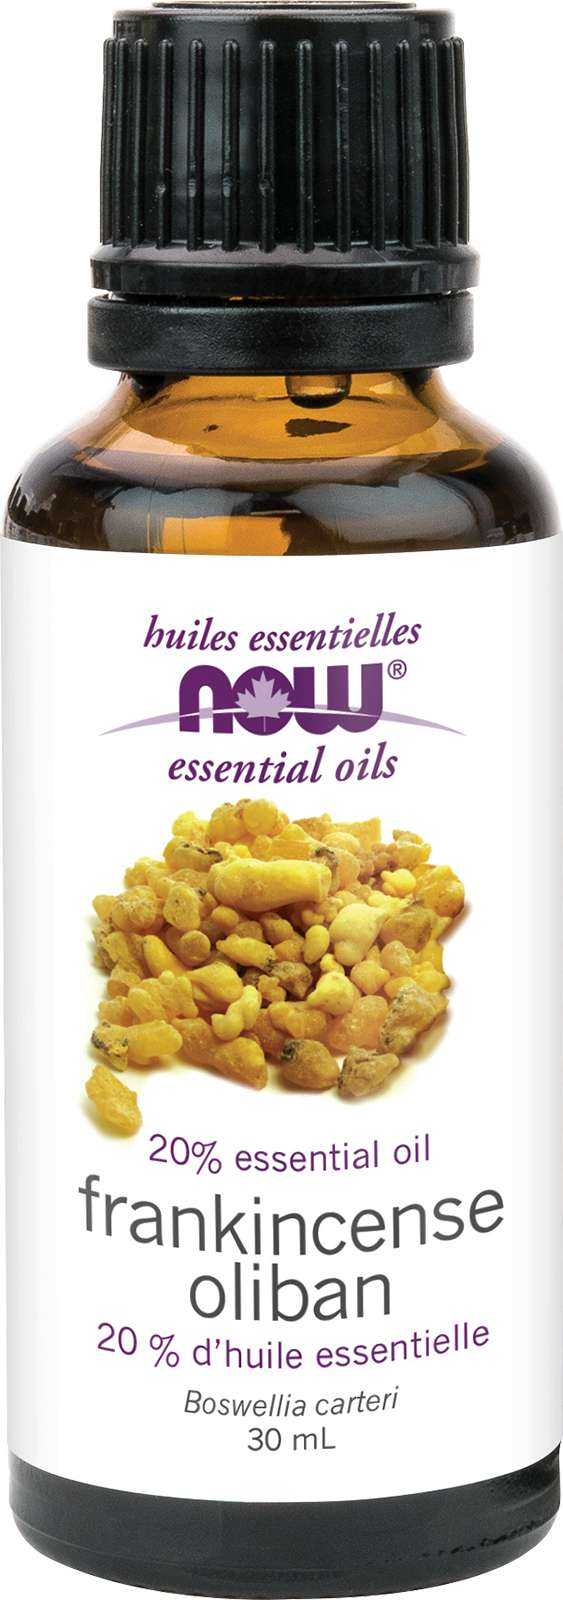 Frankincense Oil 20% (Boswellia carterii) 30mL